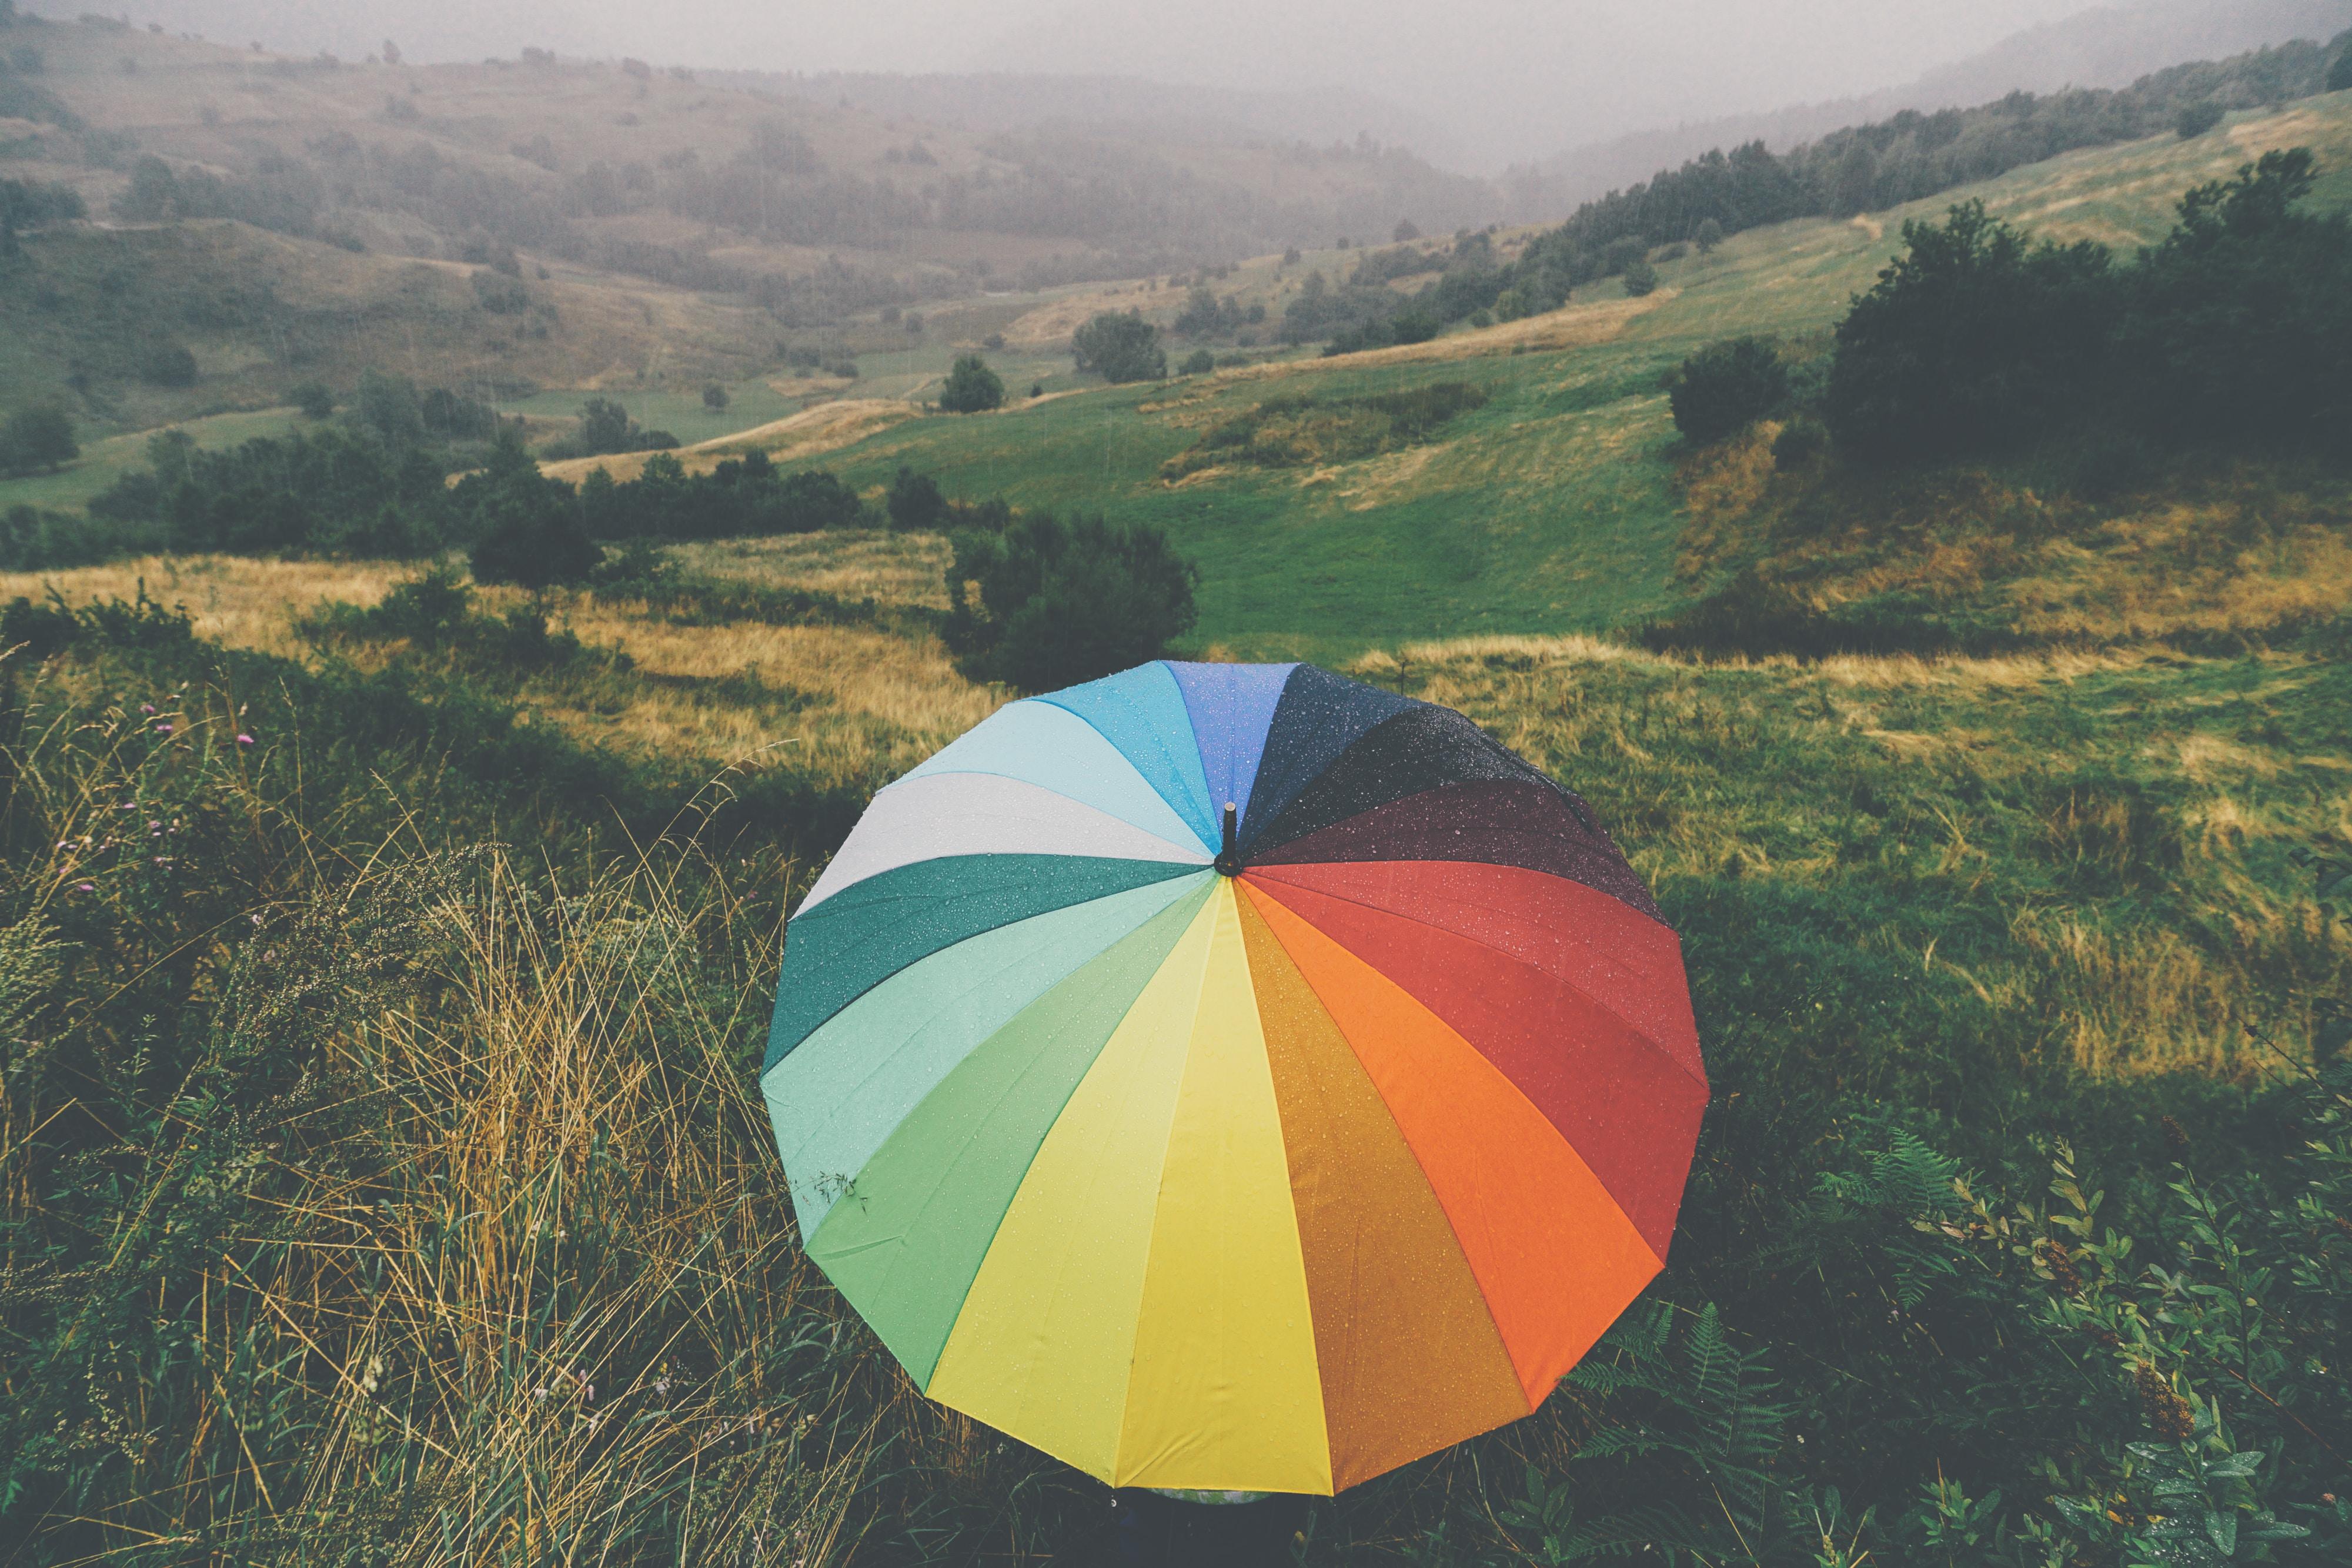 umbrella near trees